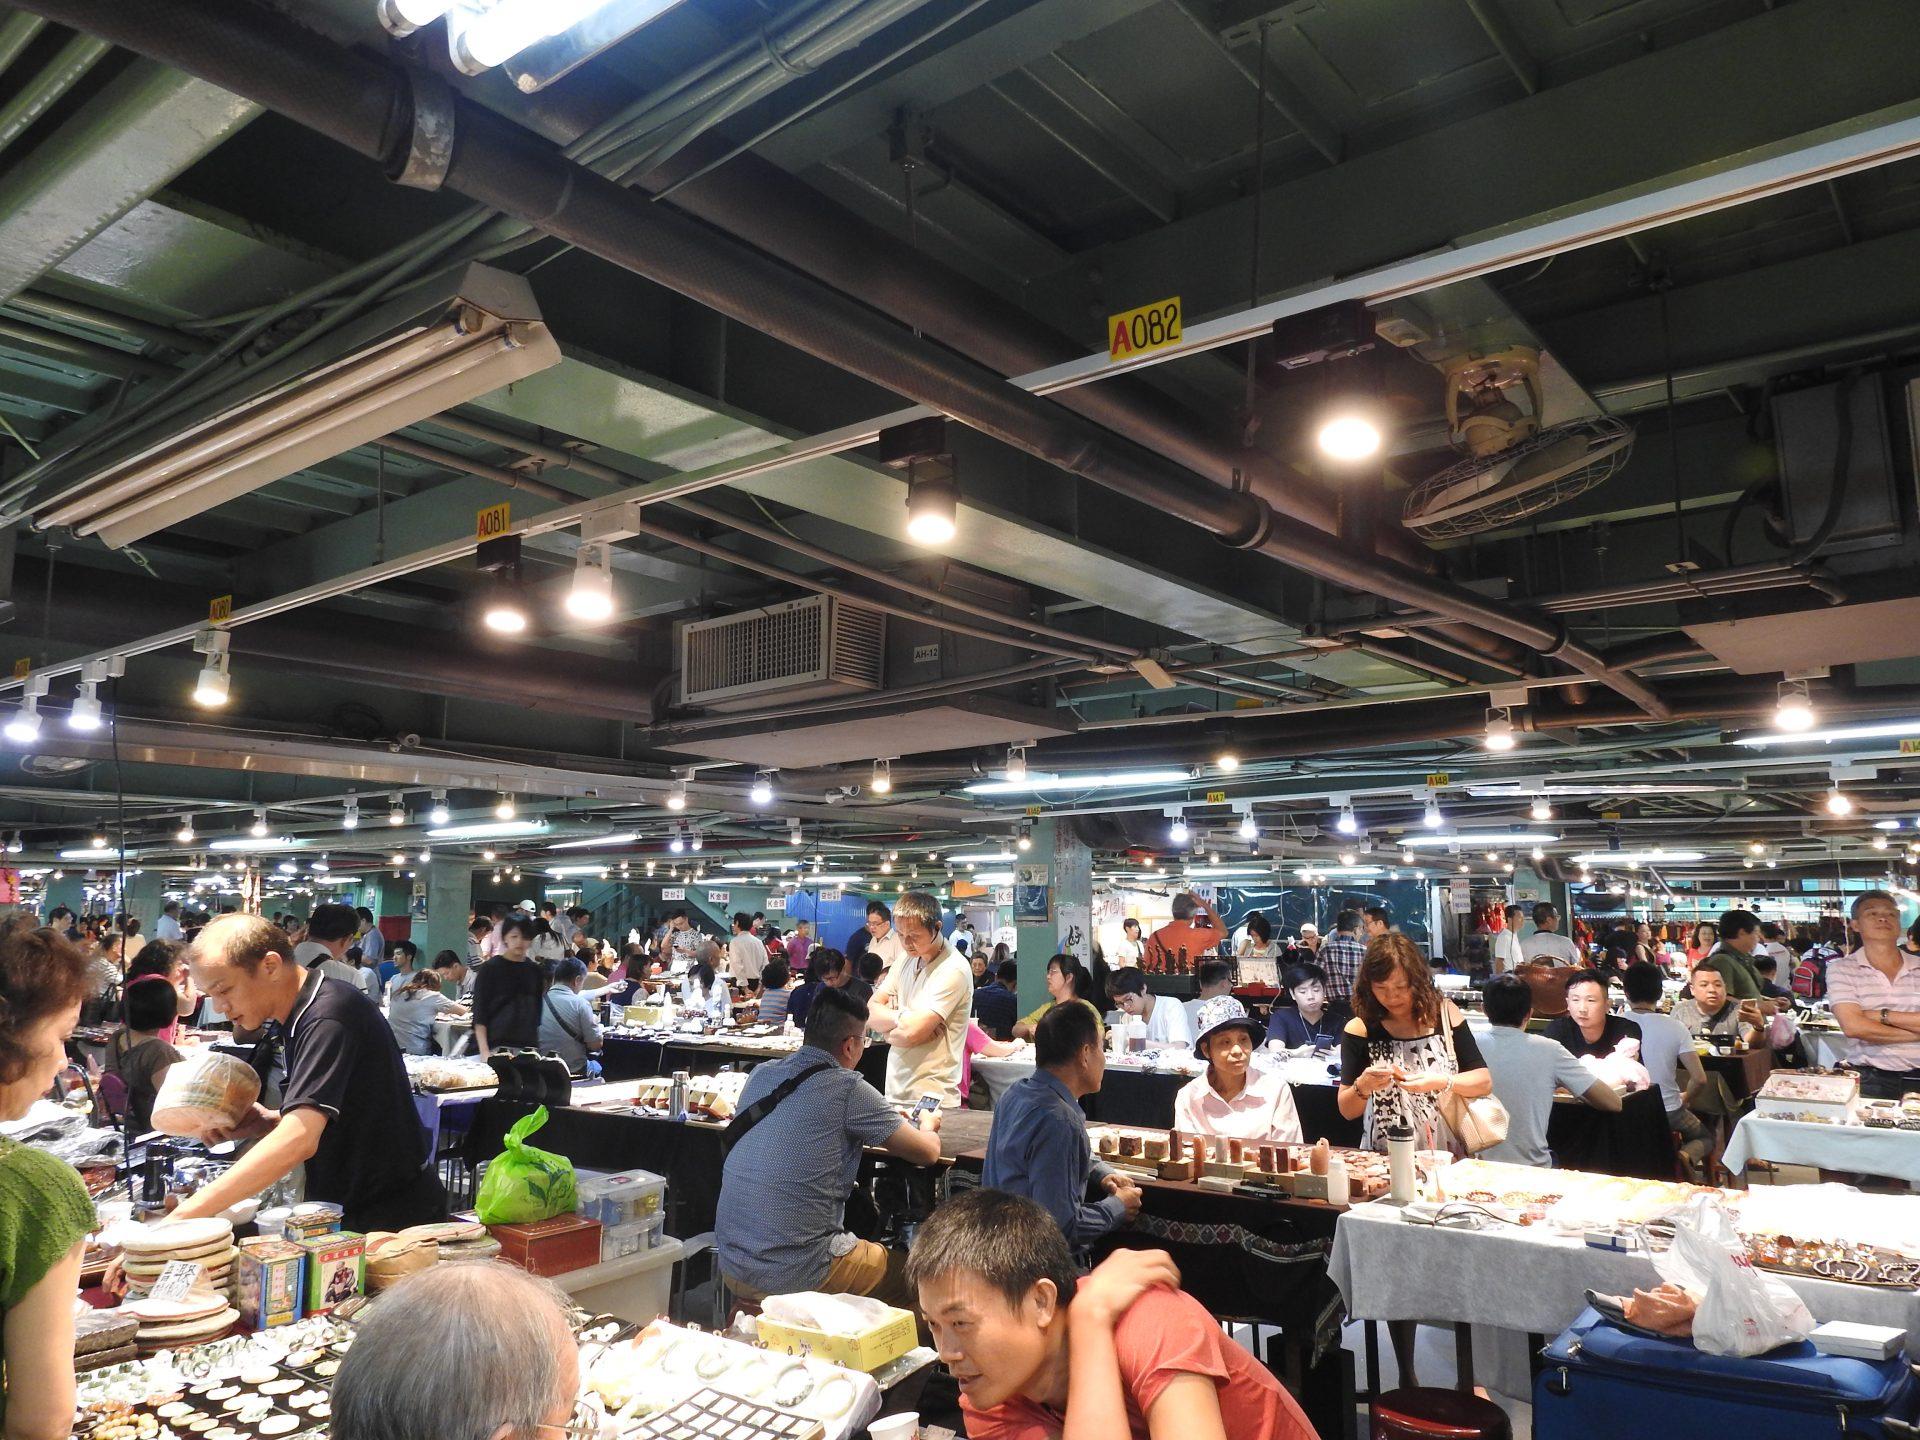 Taipei Jianguo Holiday Jade Market houses about 1,000 jade, stone and curio vendors. (Image: Billy Shyu/ Vision Times)